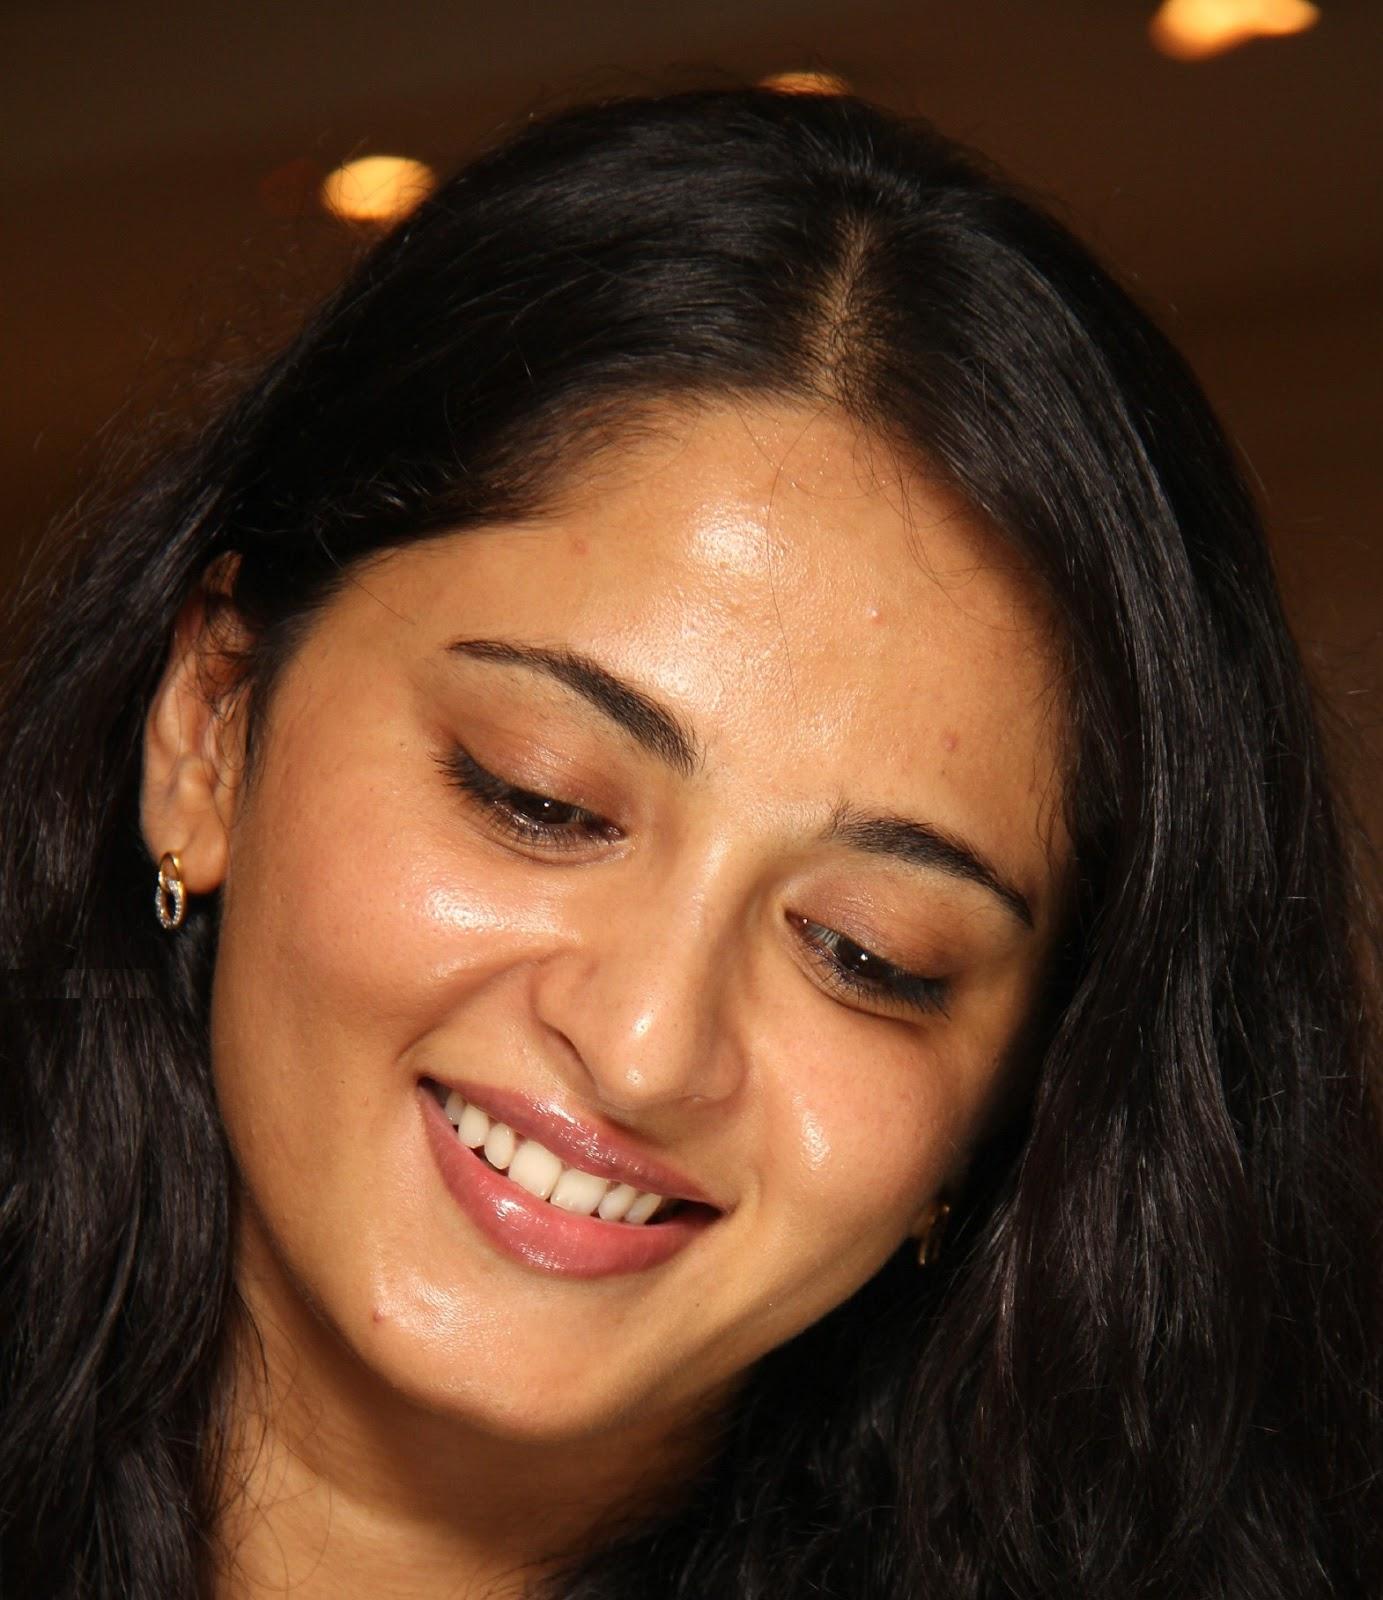 Anushka Shetty Pimple Face Close Up Stills